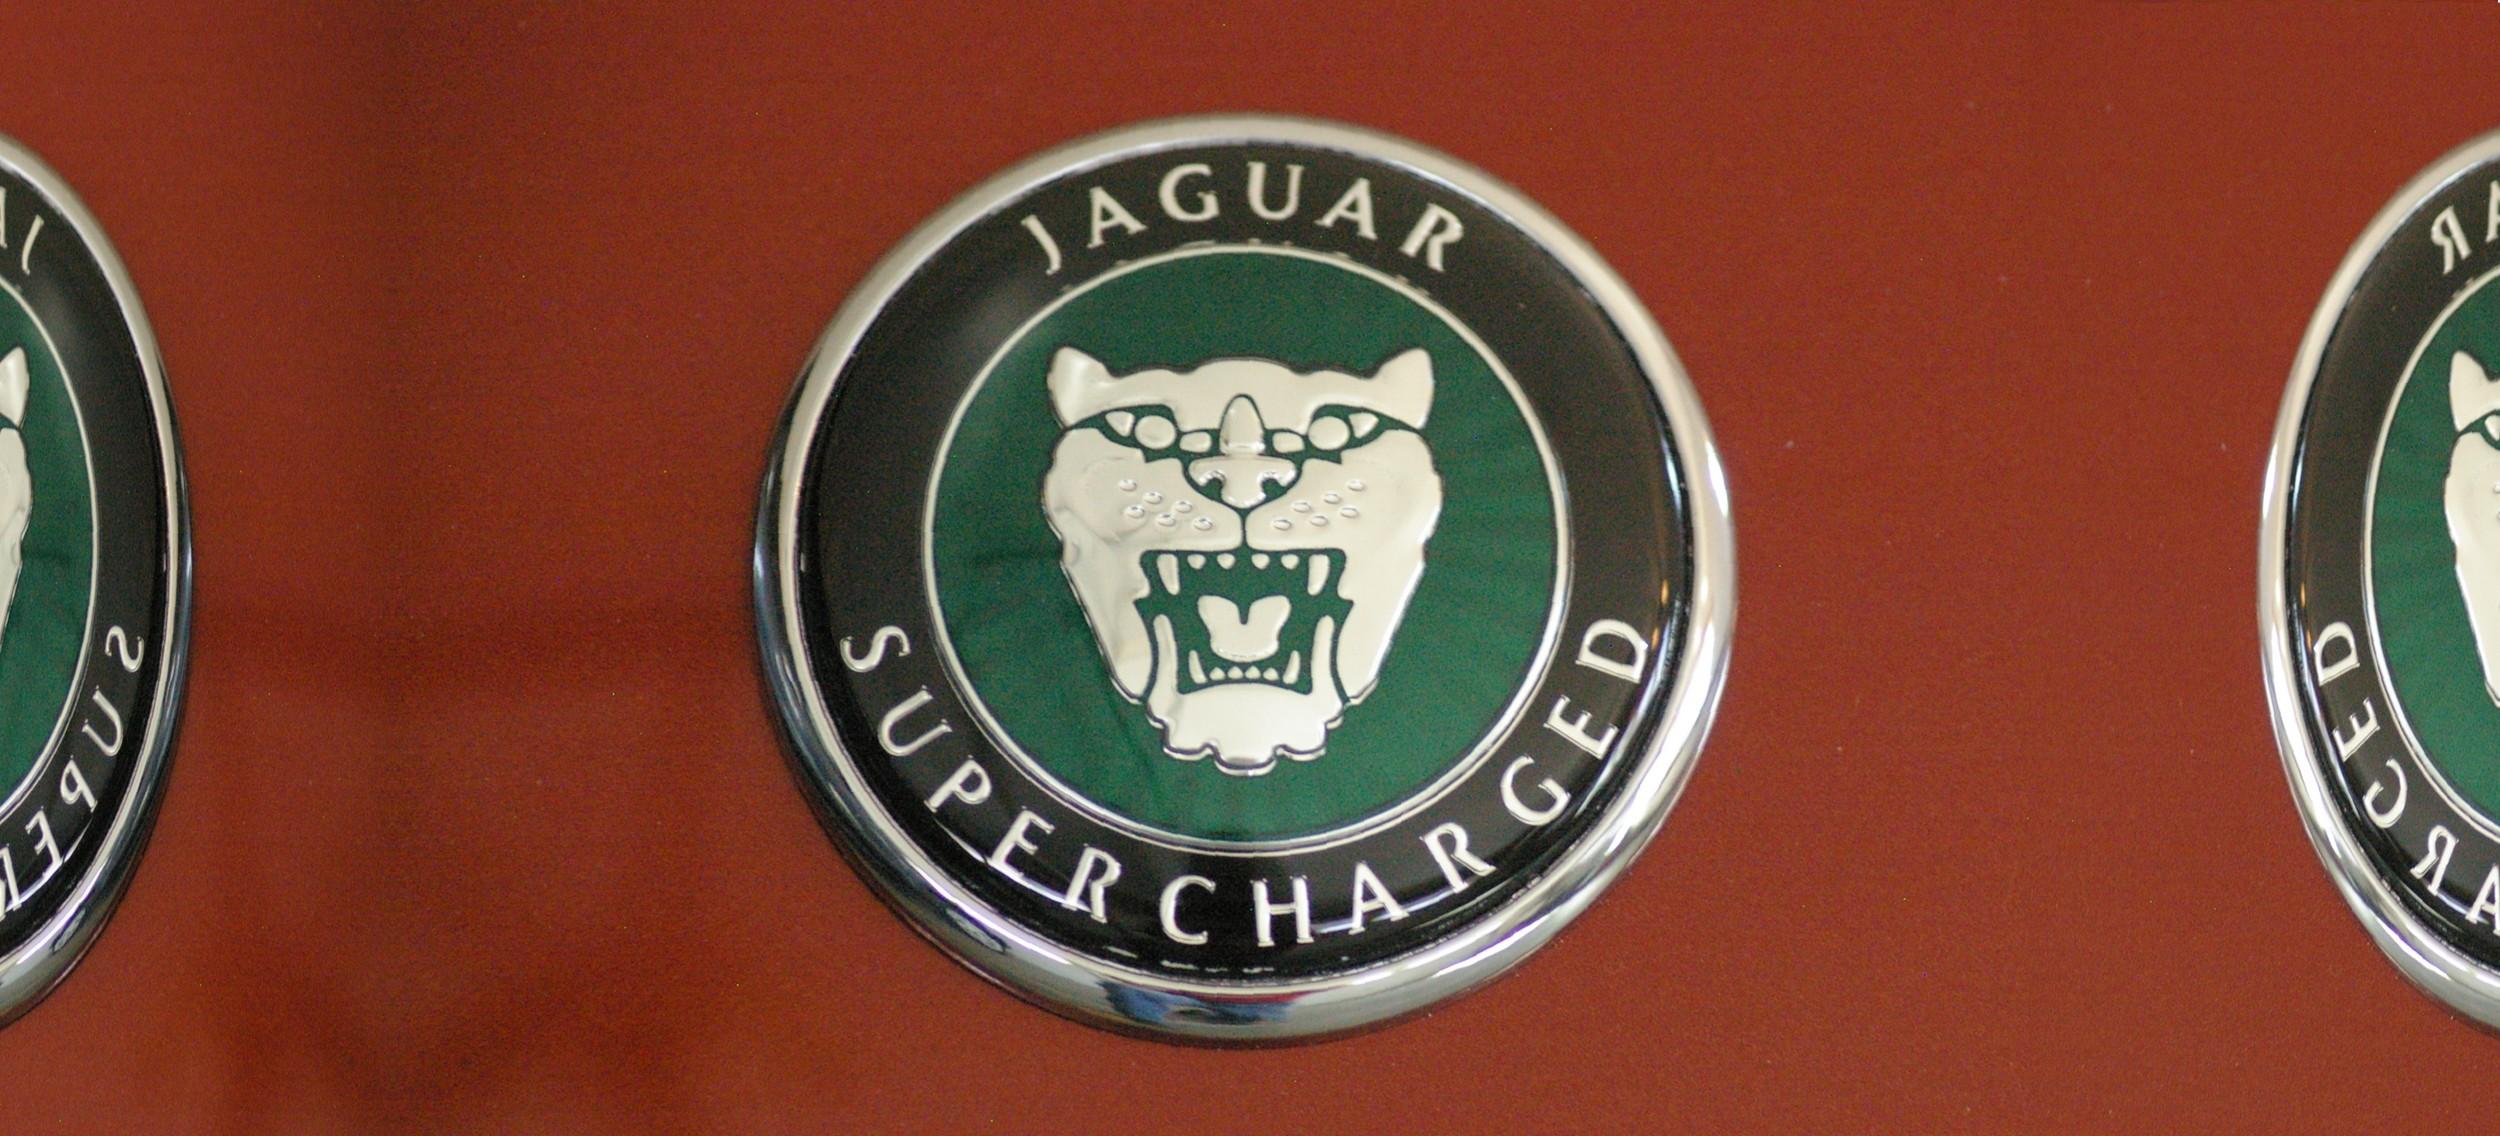 Jaguar_Supercharged_1.jpg